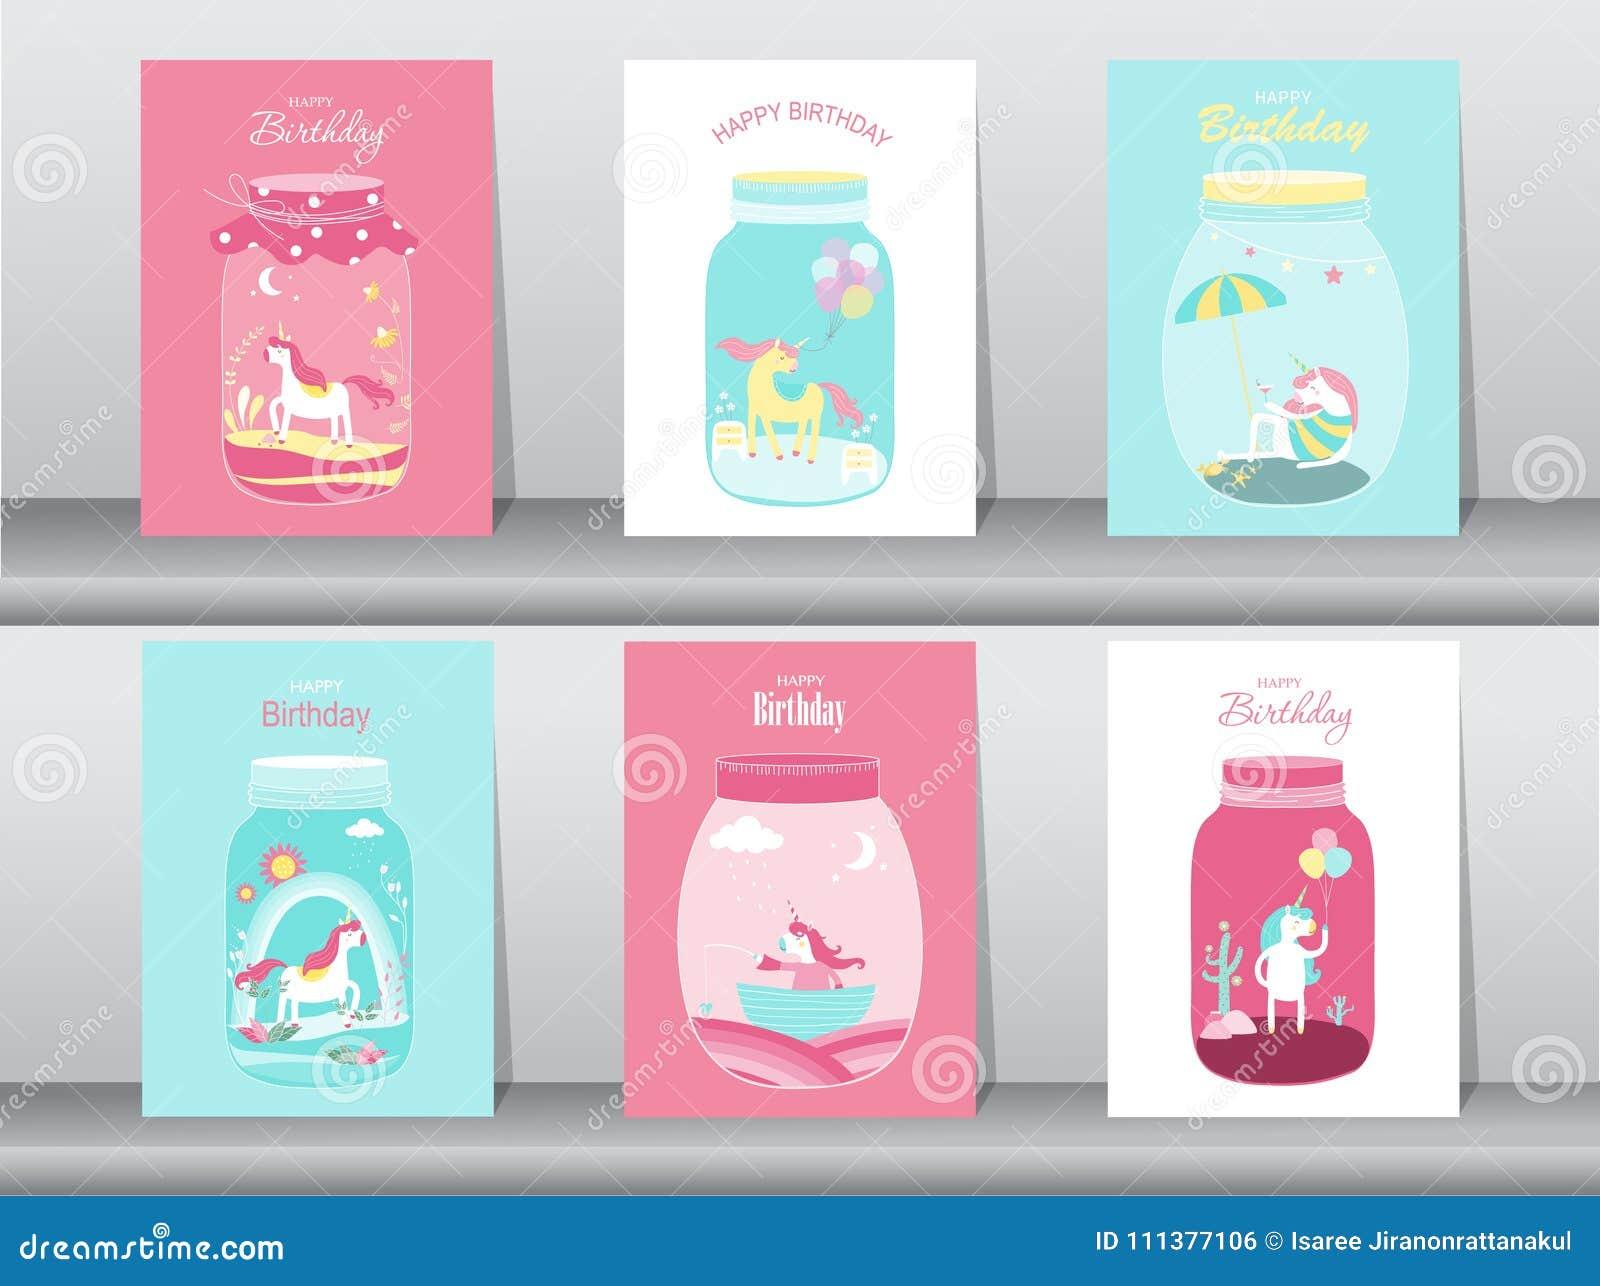 Set Of Birthday Cardsposterinvitations Cardstemplategreeting Cards